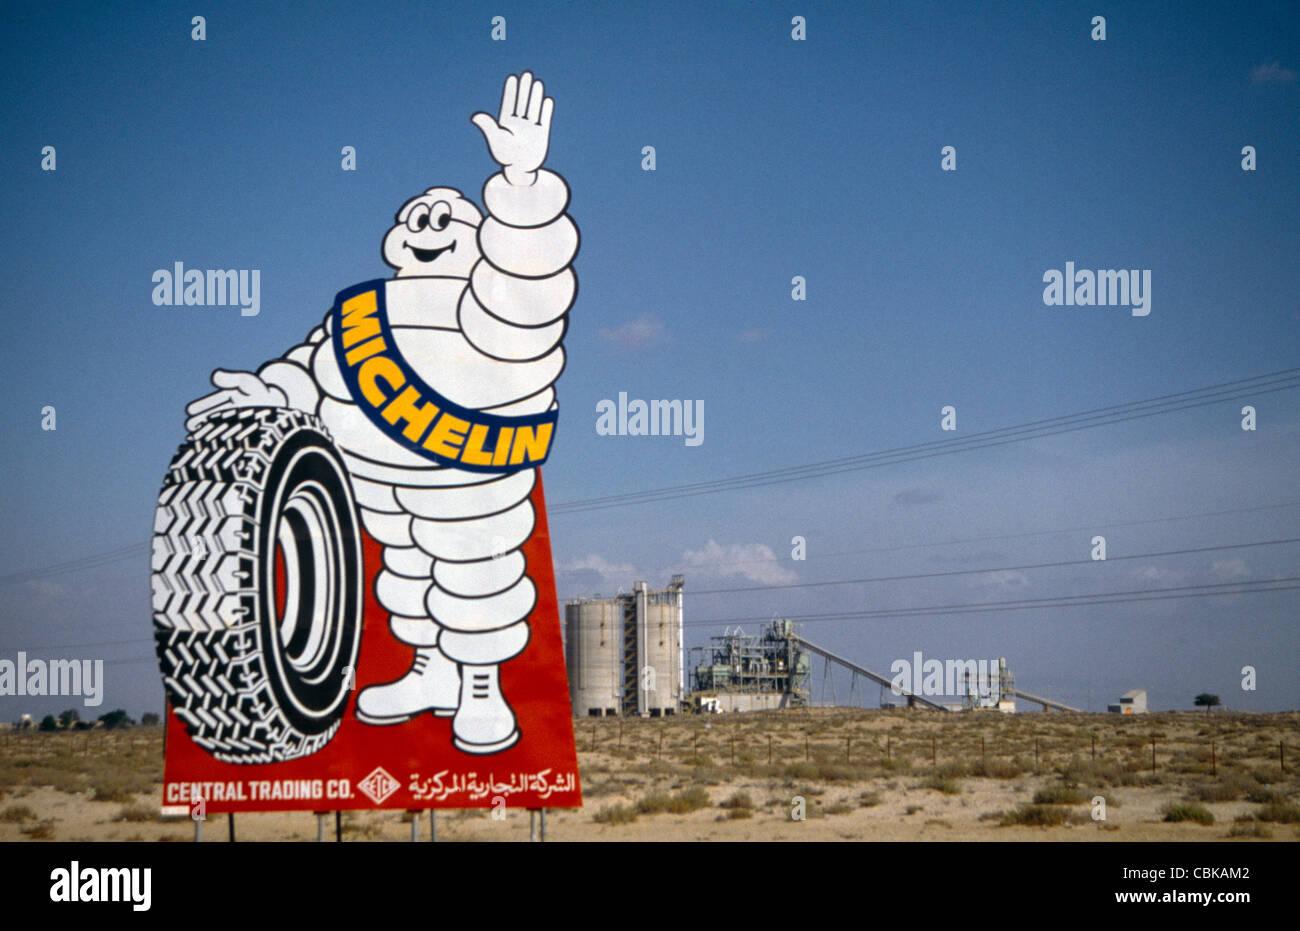 Michelin Advert Stock Photos Images Alamy Fuel Filters Ras Al Khaimah Uae Advertisement Image